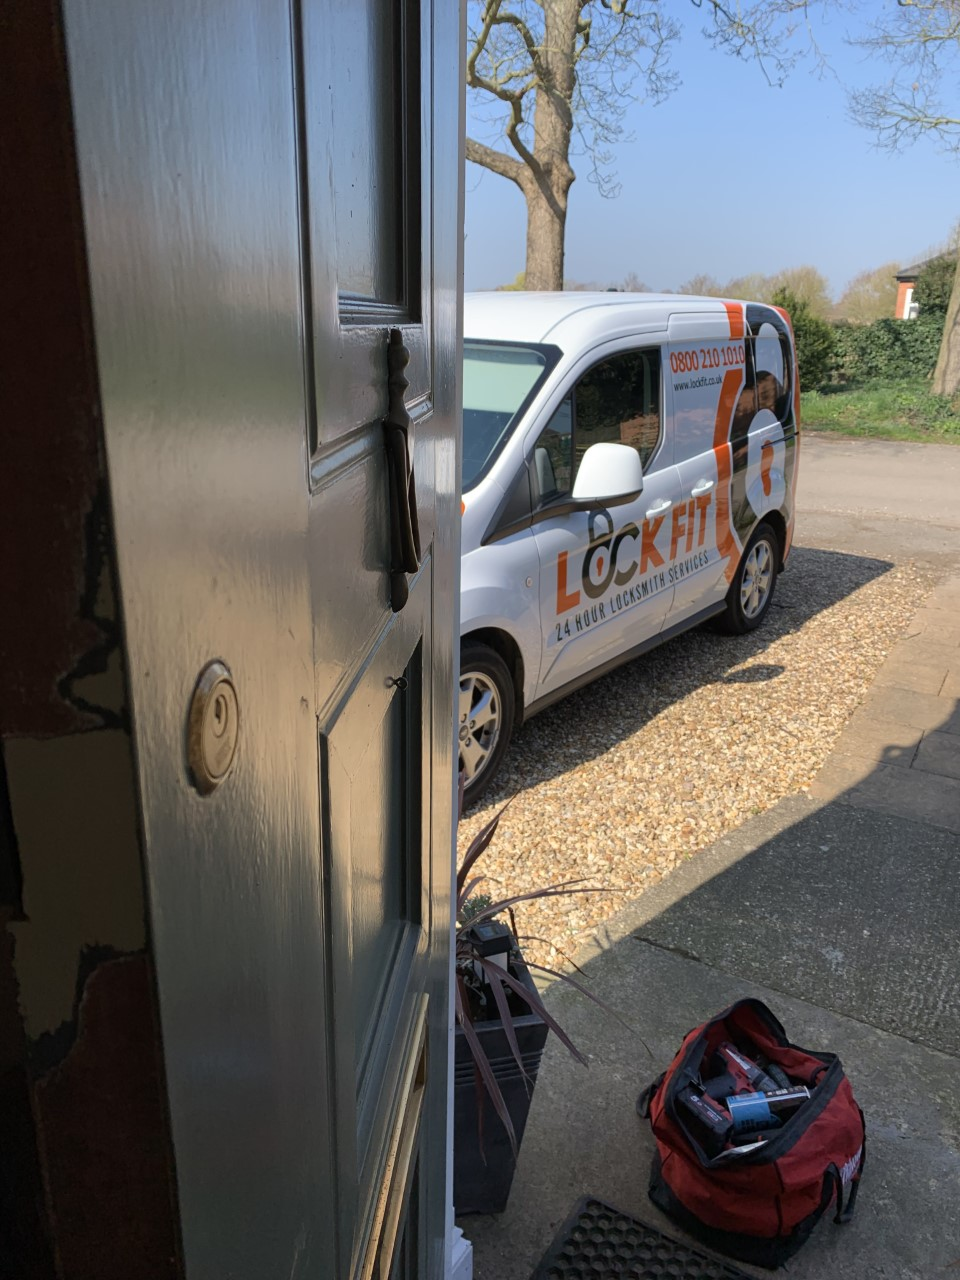 24 Hour Locksmith Services Emergency Locksmiths